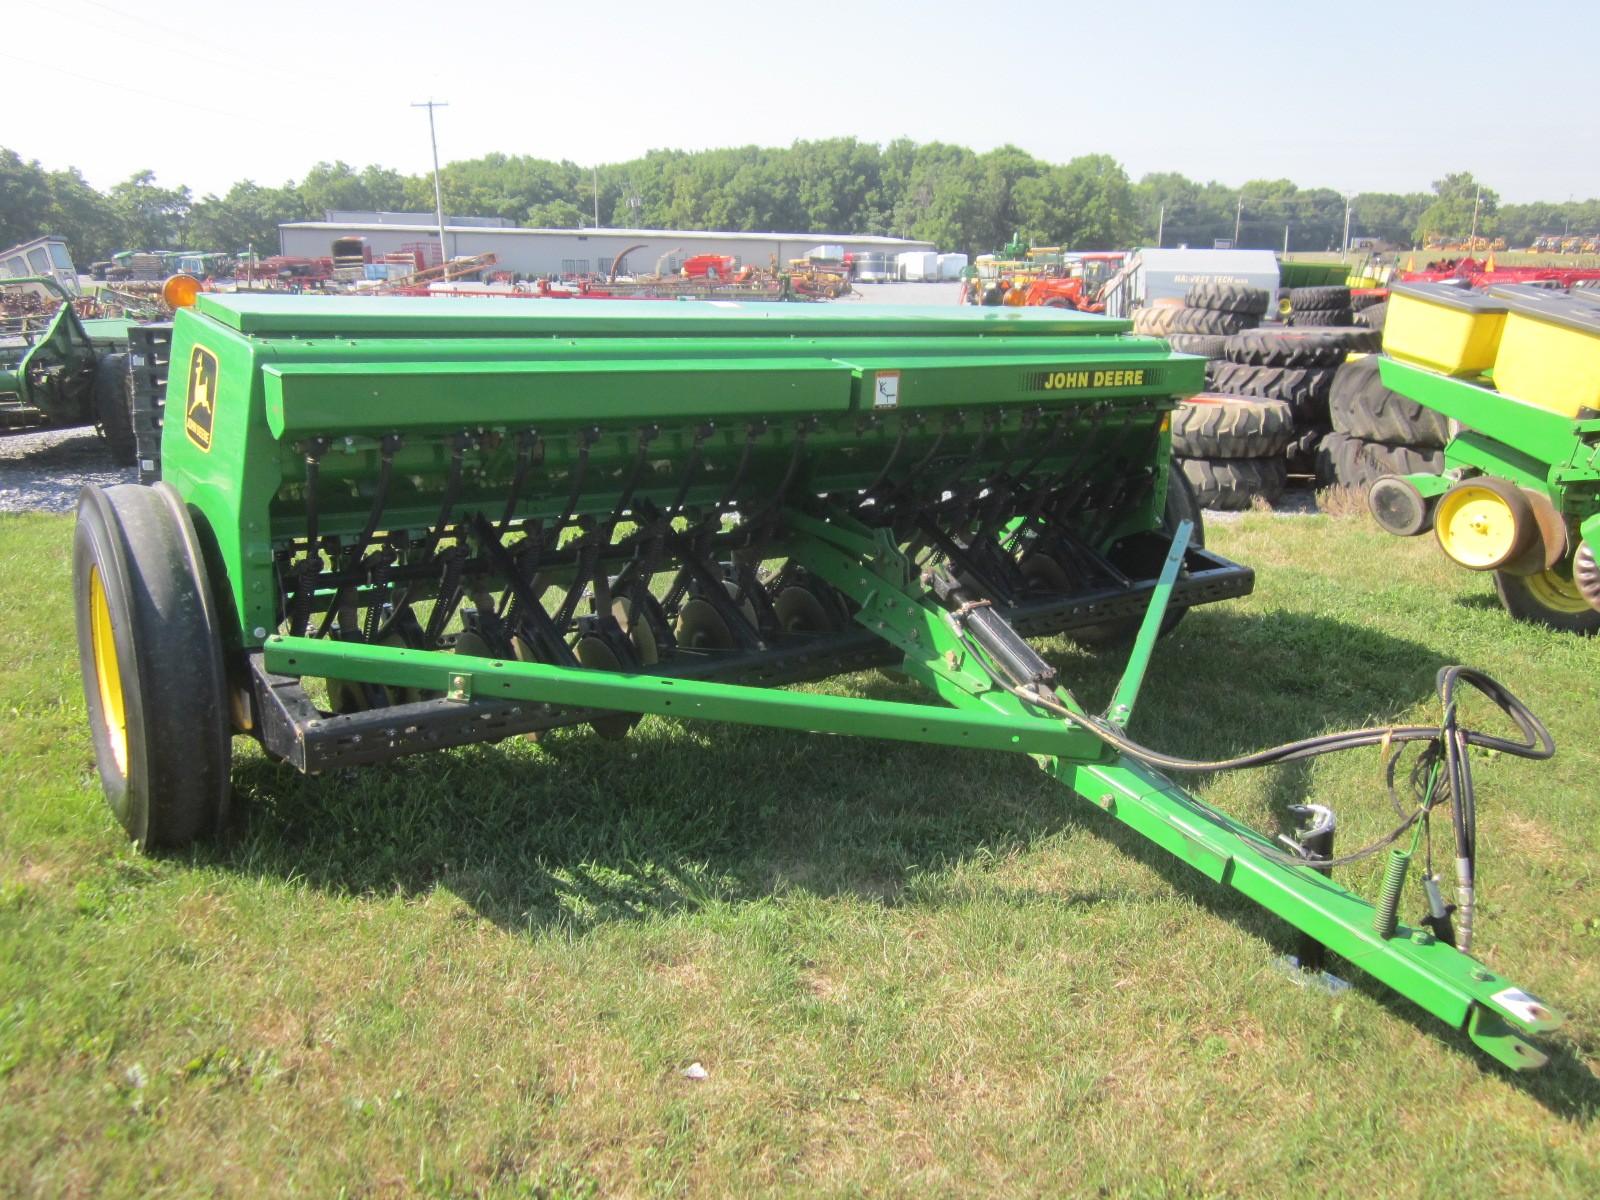 John Deere 450 10.5' drill - Farm Equipment